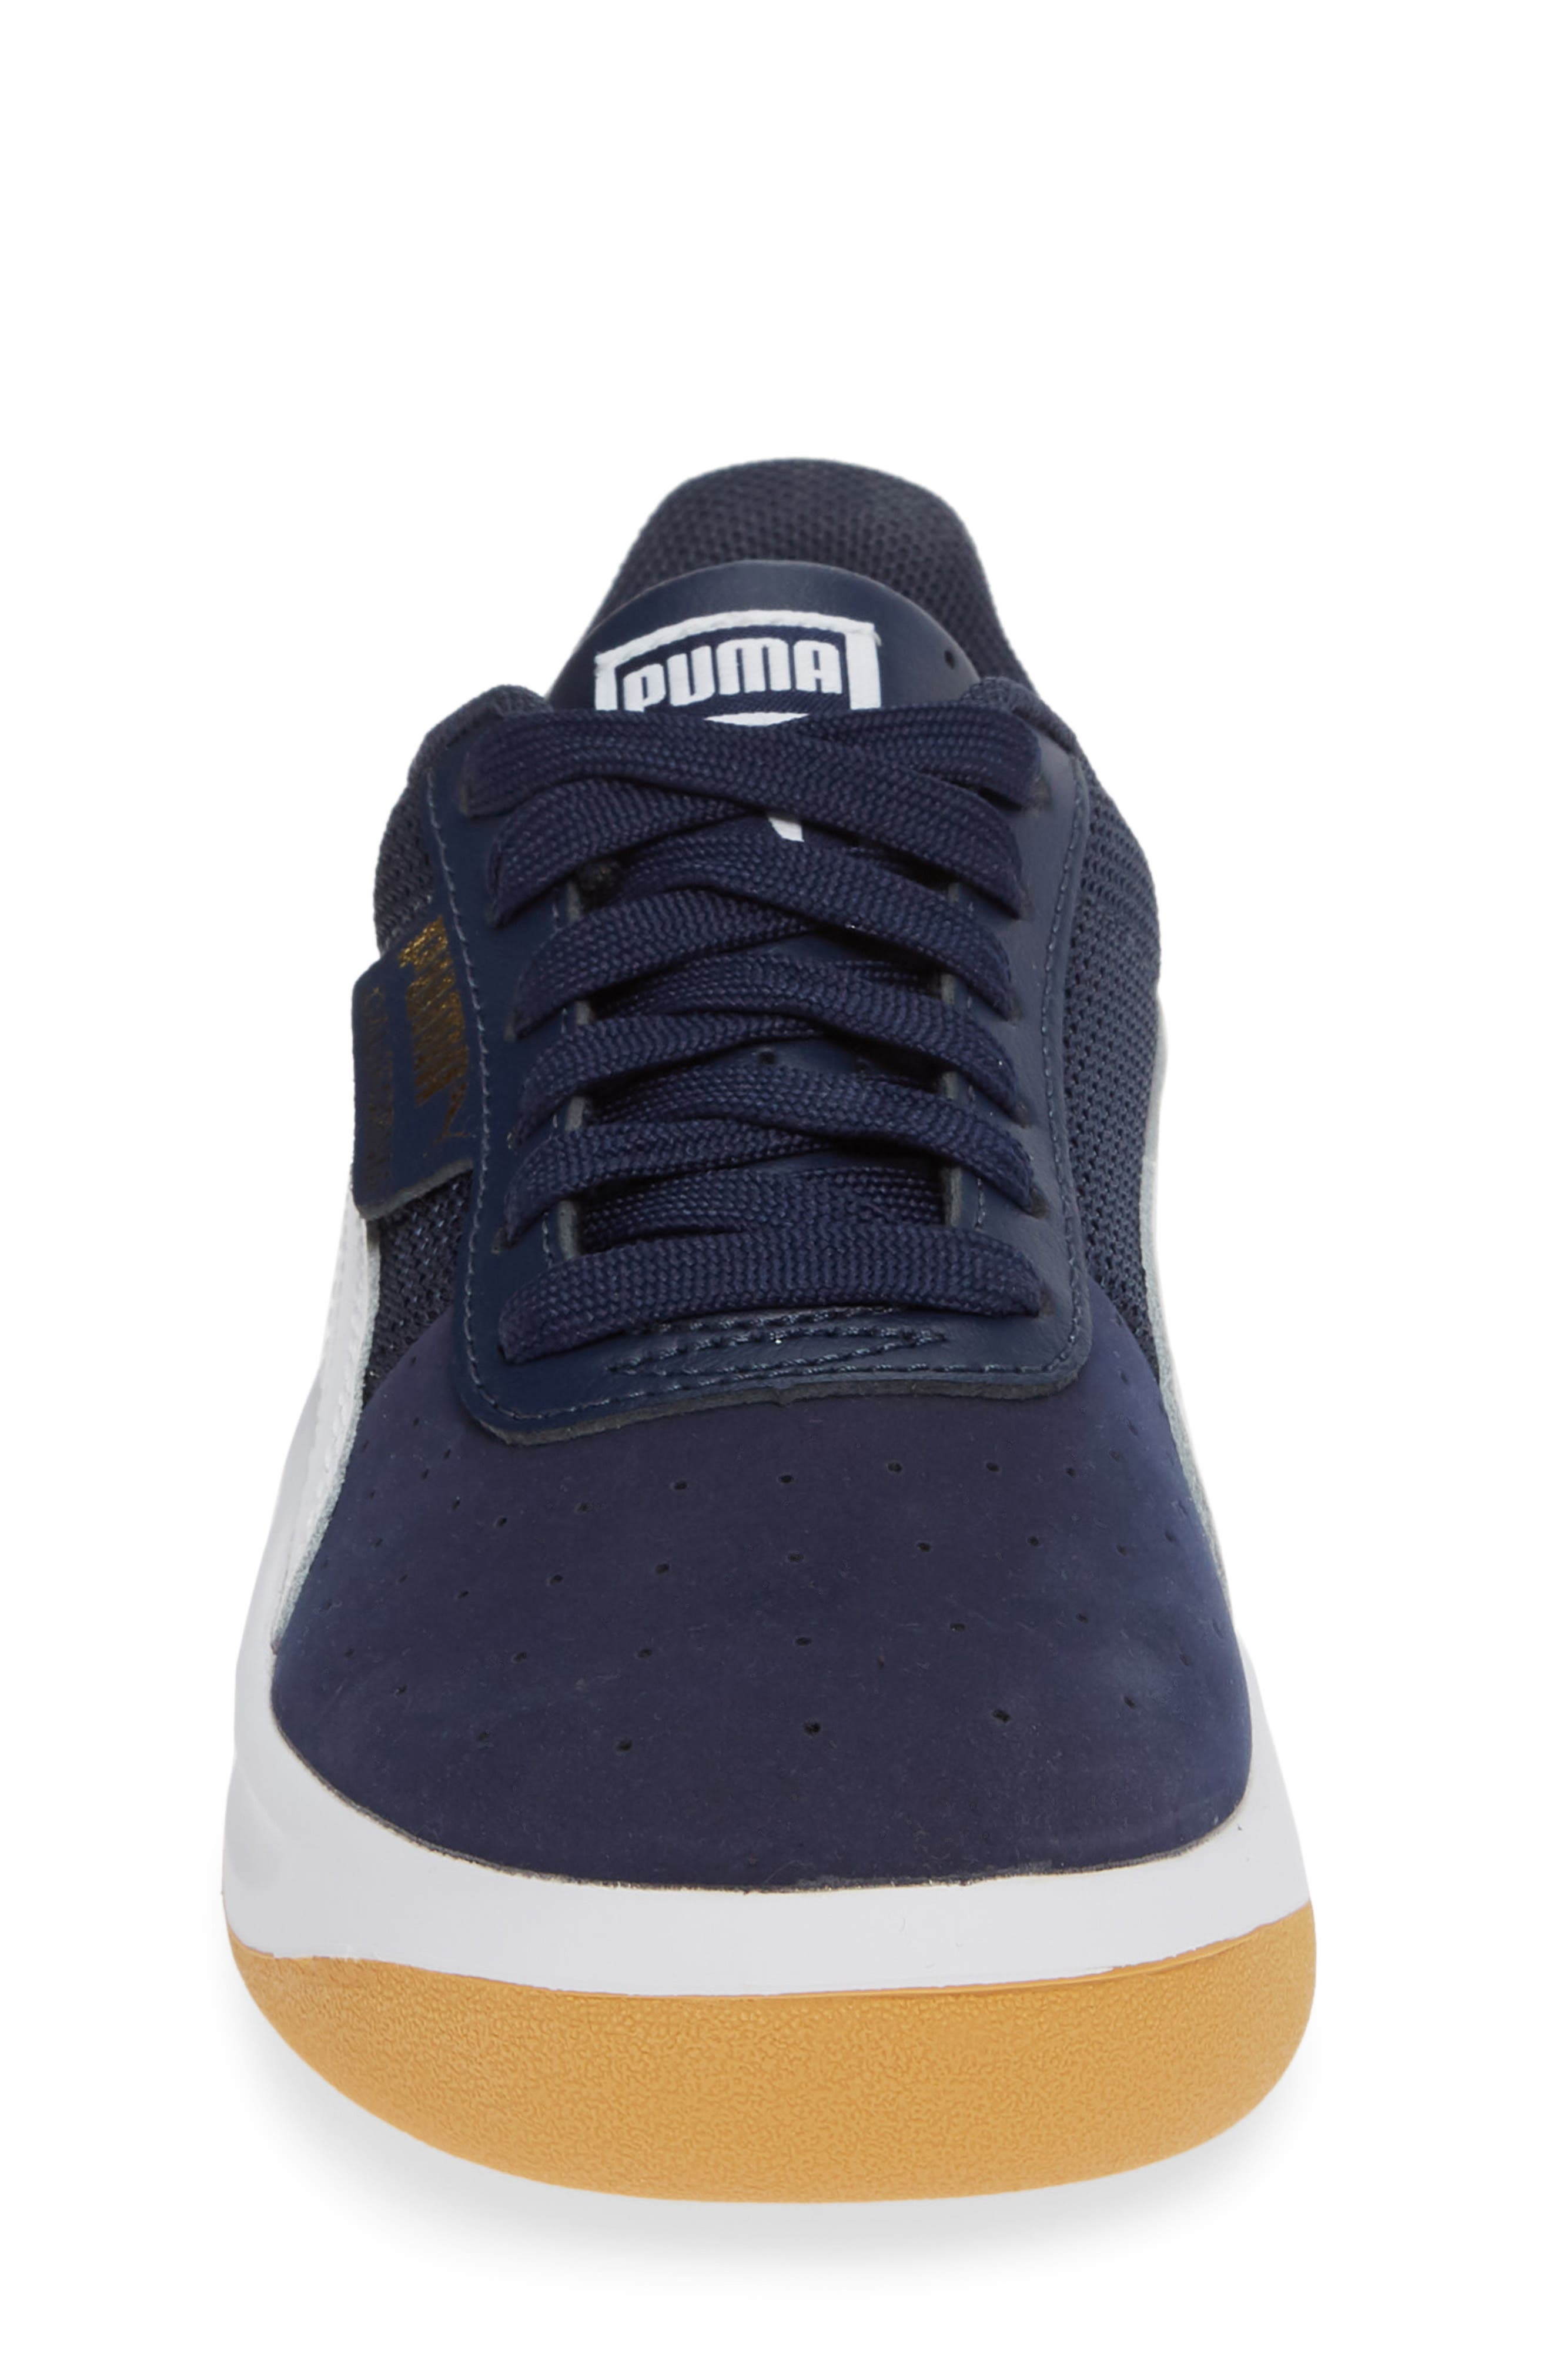 California Casual Jr. Sneaker,                             Alternate thumbnail 4, color,                             PEACOAT-PUMA WHITE-GOLD